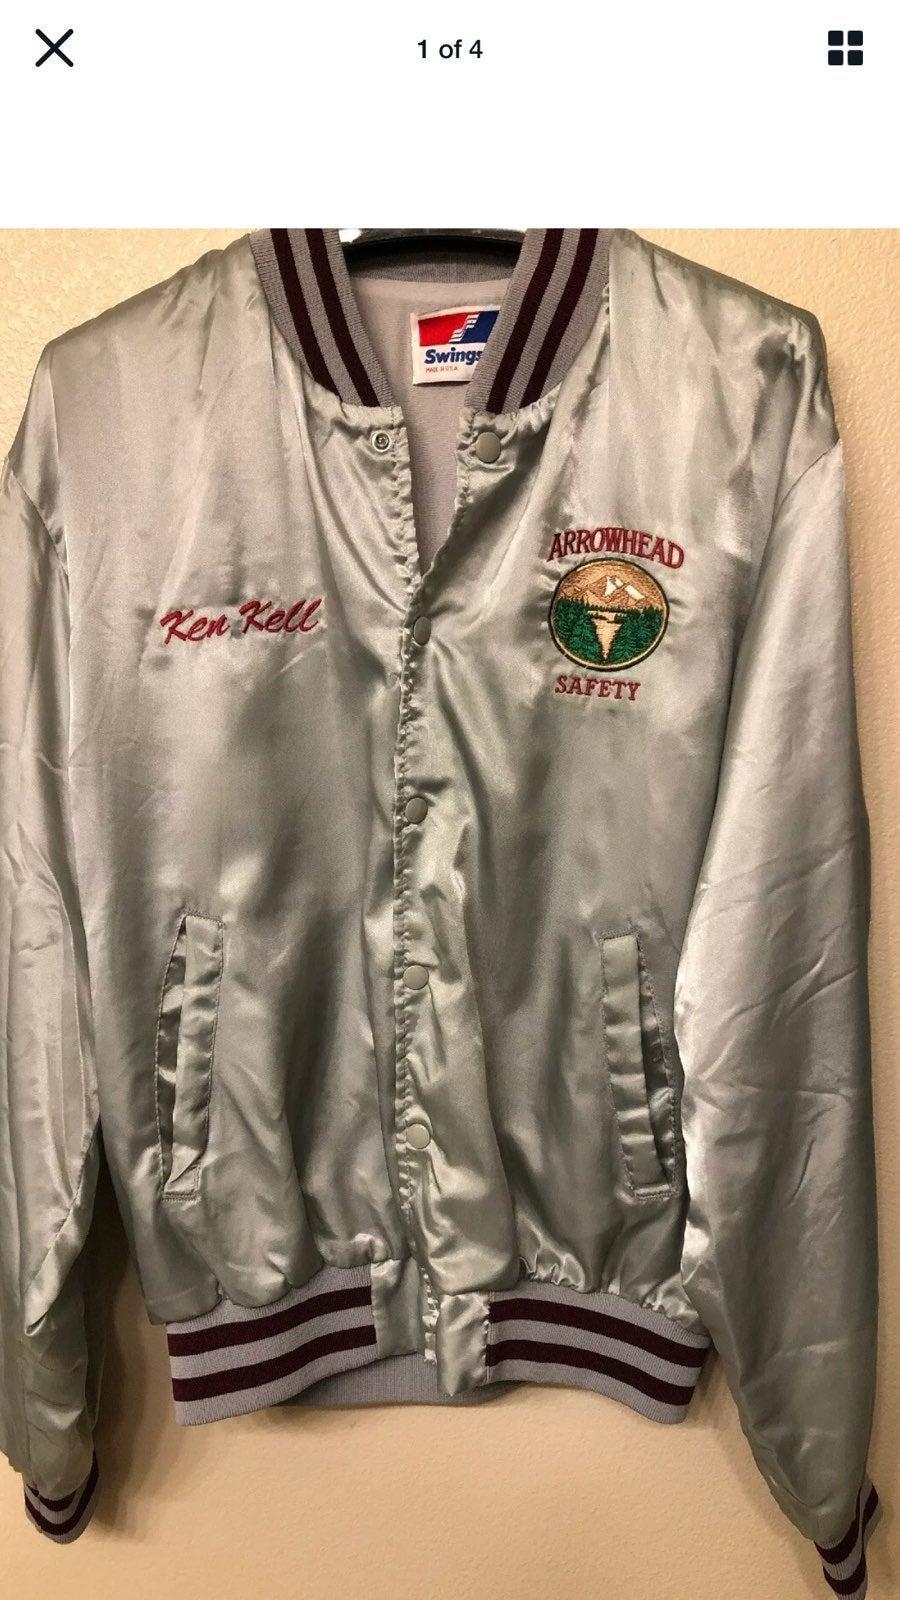 vtg swingster jacket arrowhead uniform